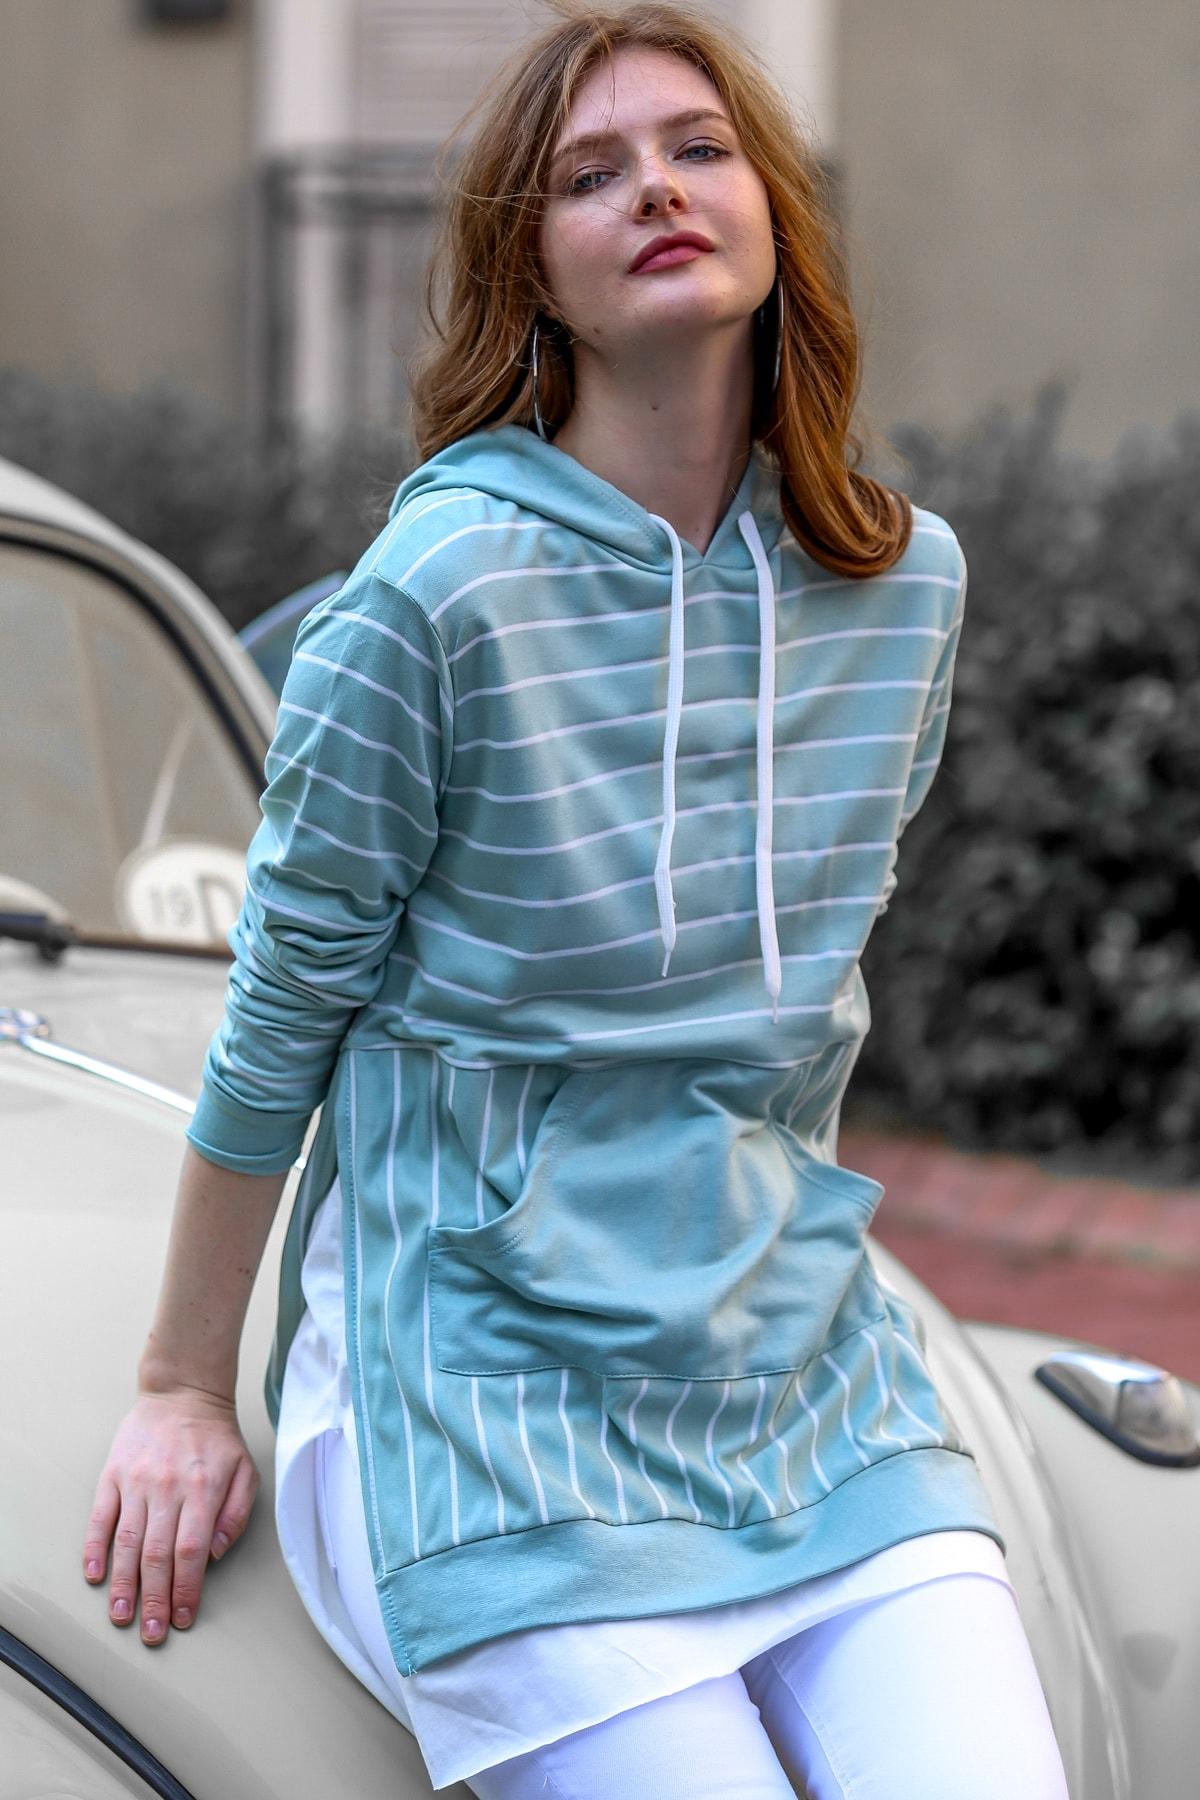 Chiccy Kadın Mint Vintage Çizgili Etek Ucu 2 Parça Yırtmaçlı Kanguru Cepli Sweat M10010700SW99336